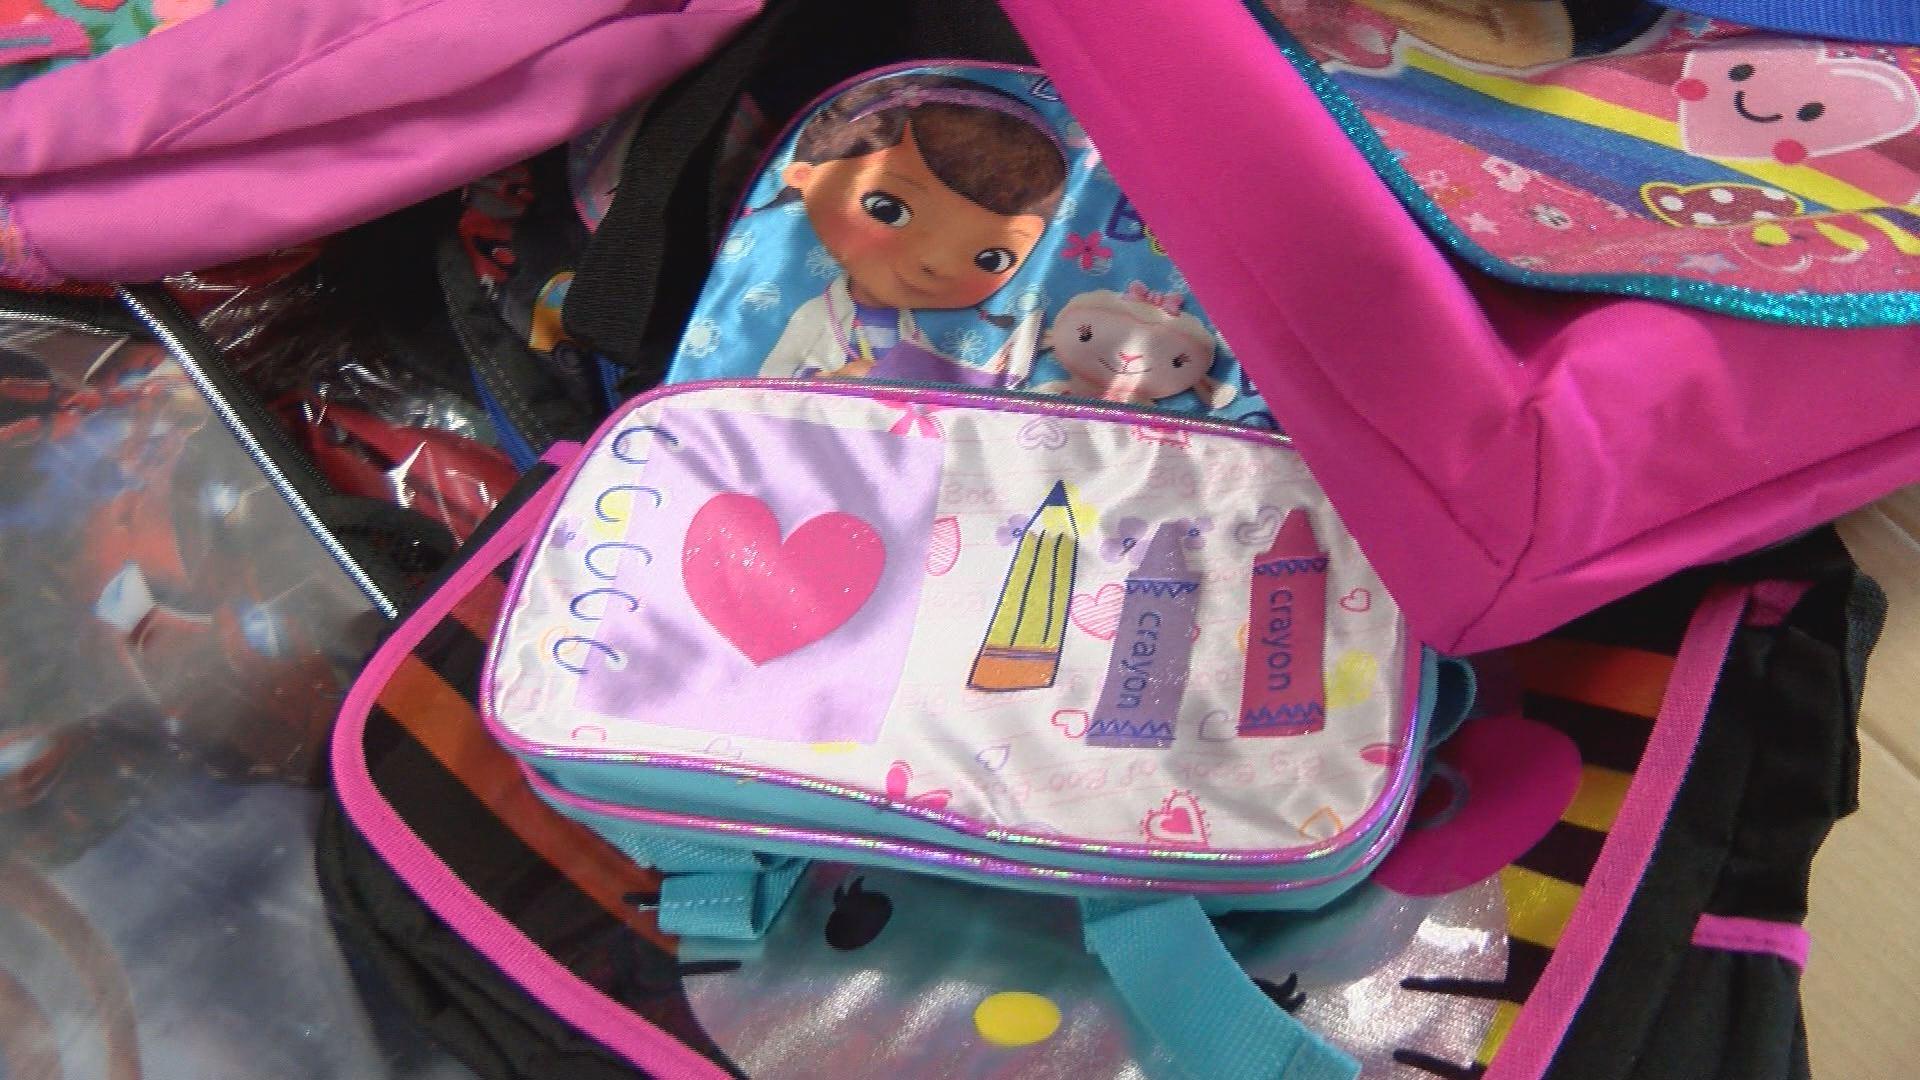 bookbags-for-matthew-victims_311017